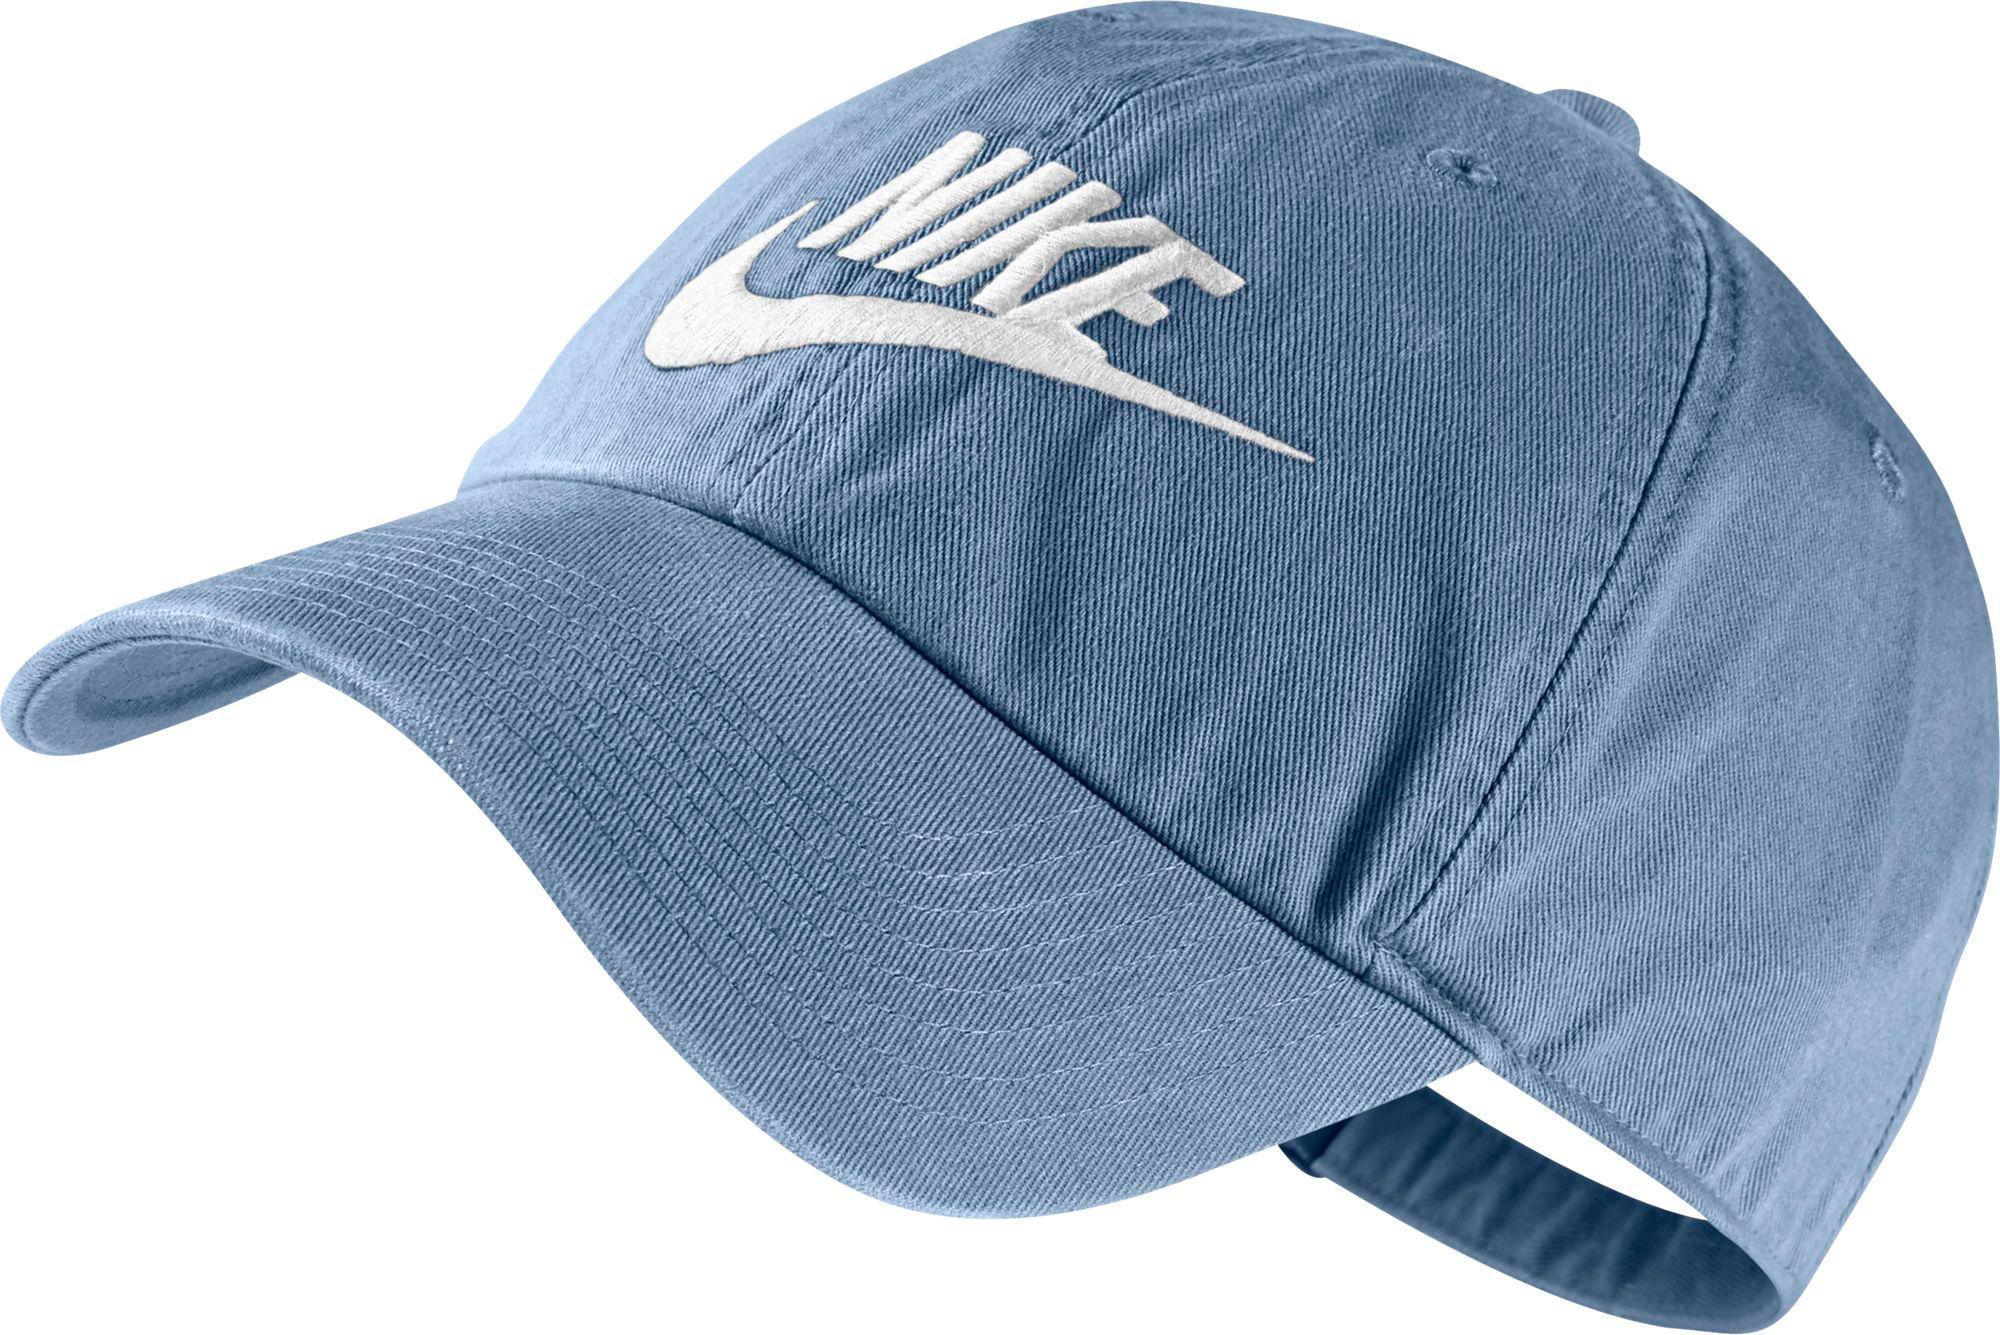 reputable site 7ec9a 9c537 Nike - Blue Heritage 86 Futura Adjustable Hat for Men - Lyst